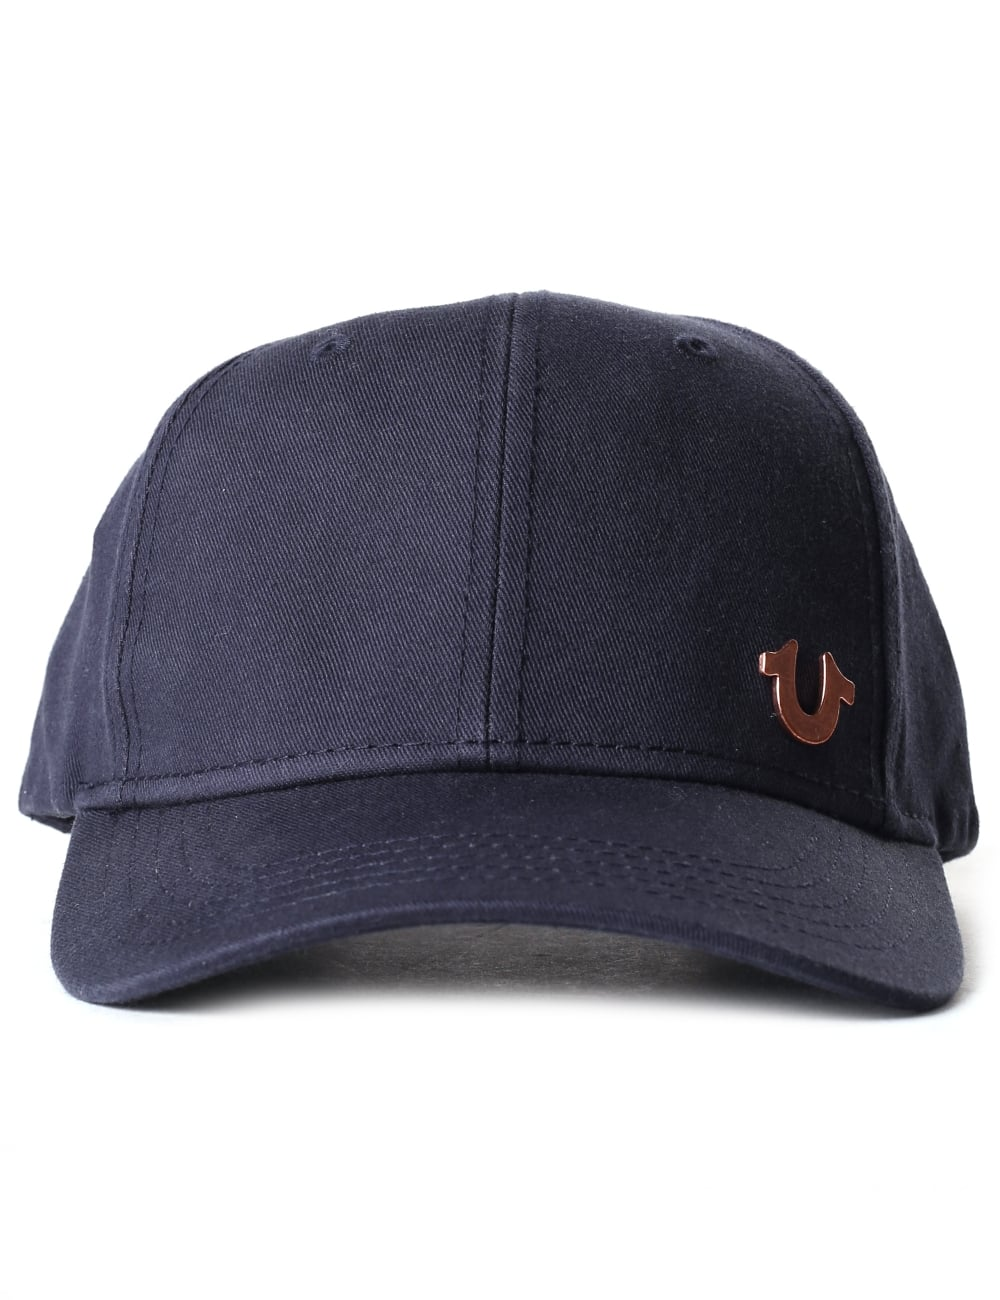 True Religion Core Logo Men s Baseball Cap 6944411e6ec0